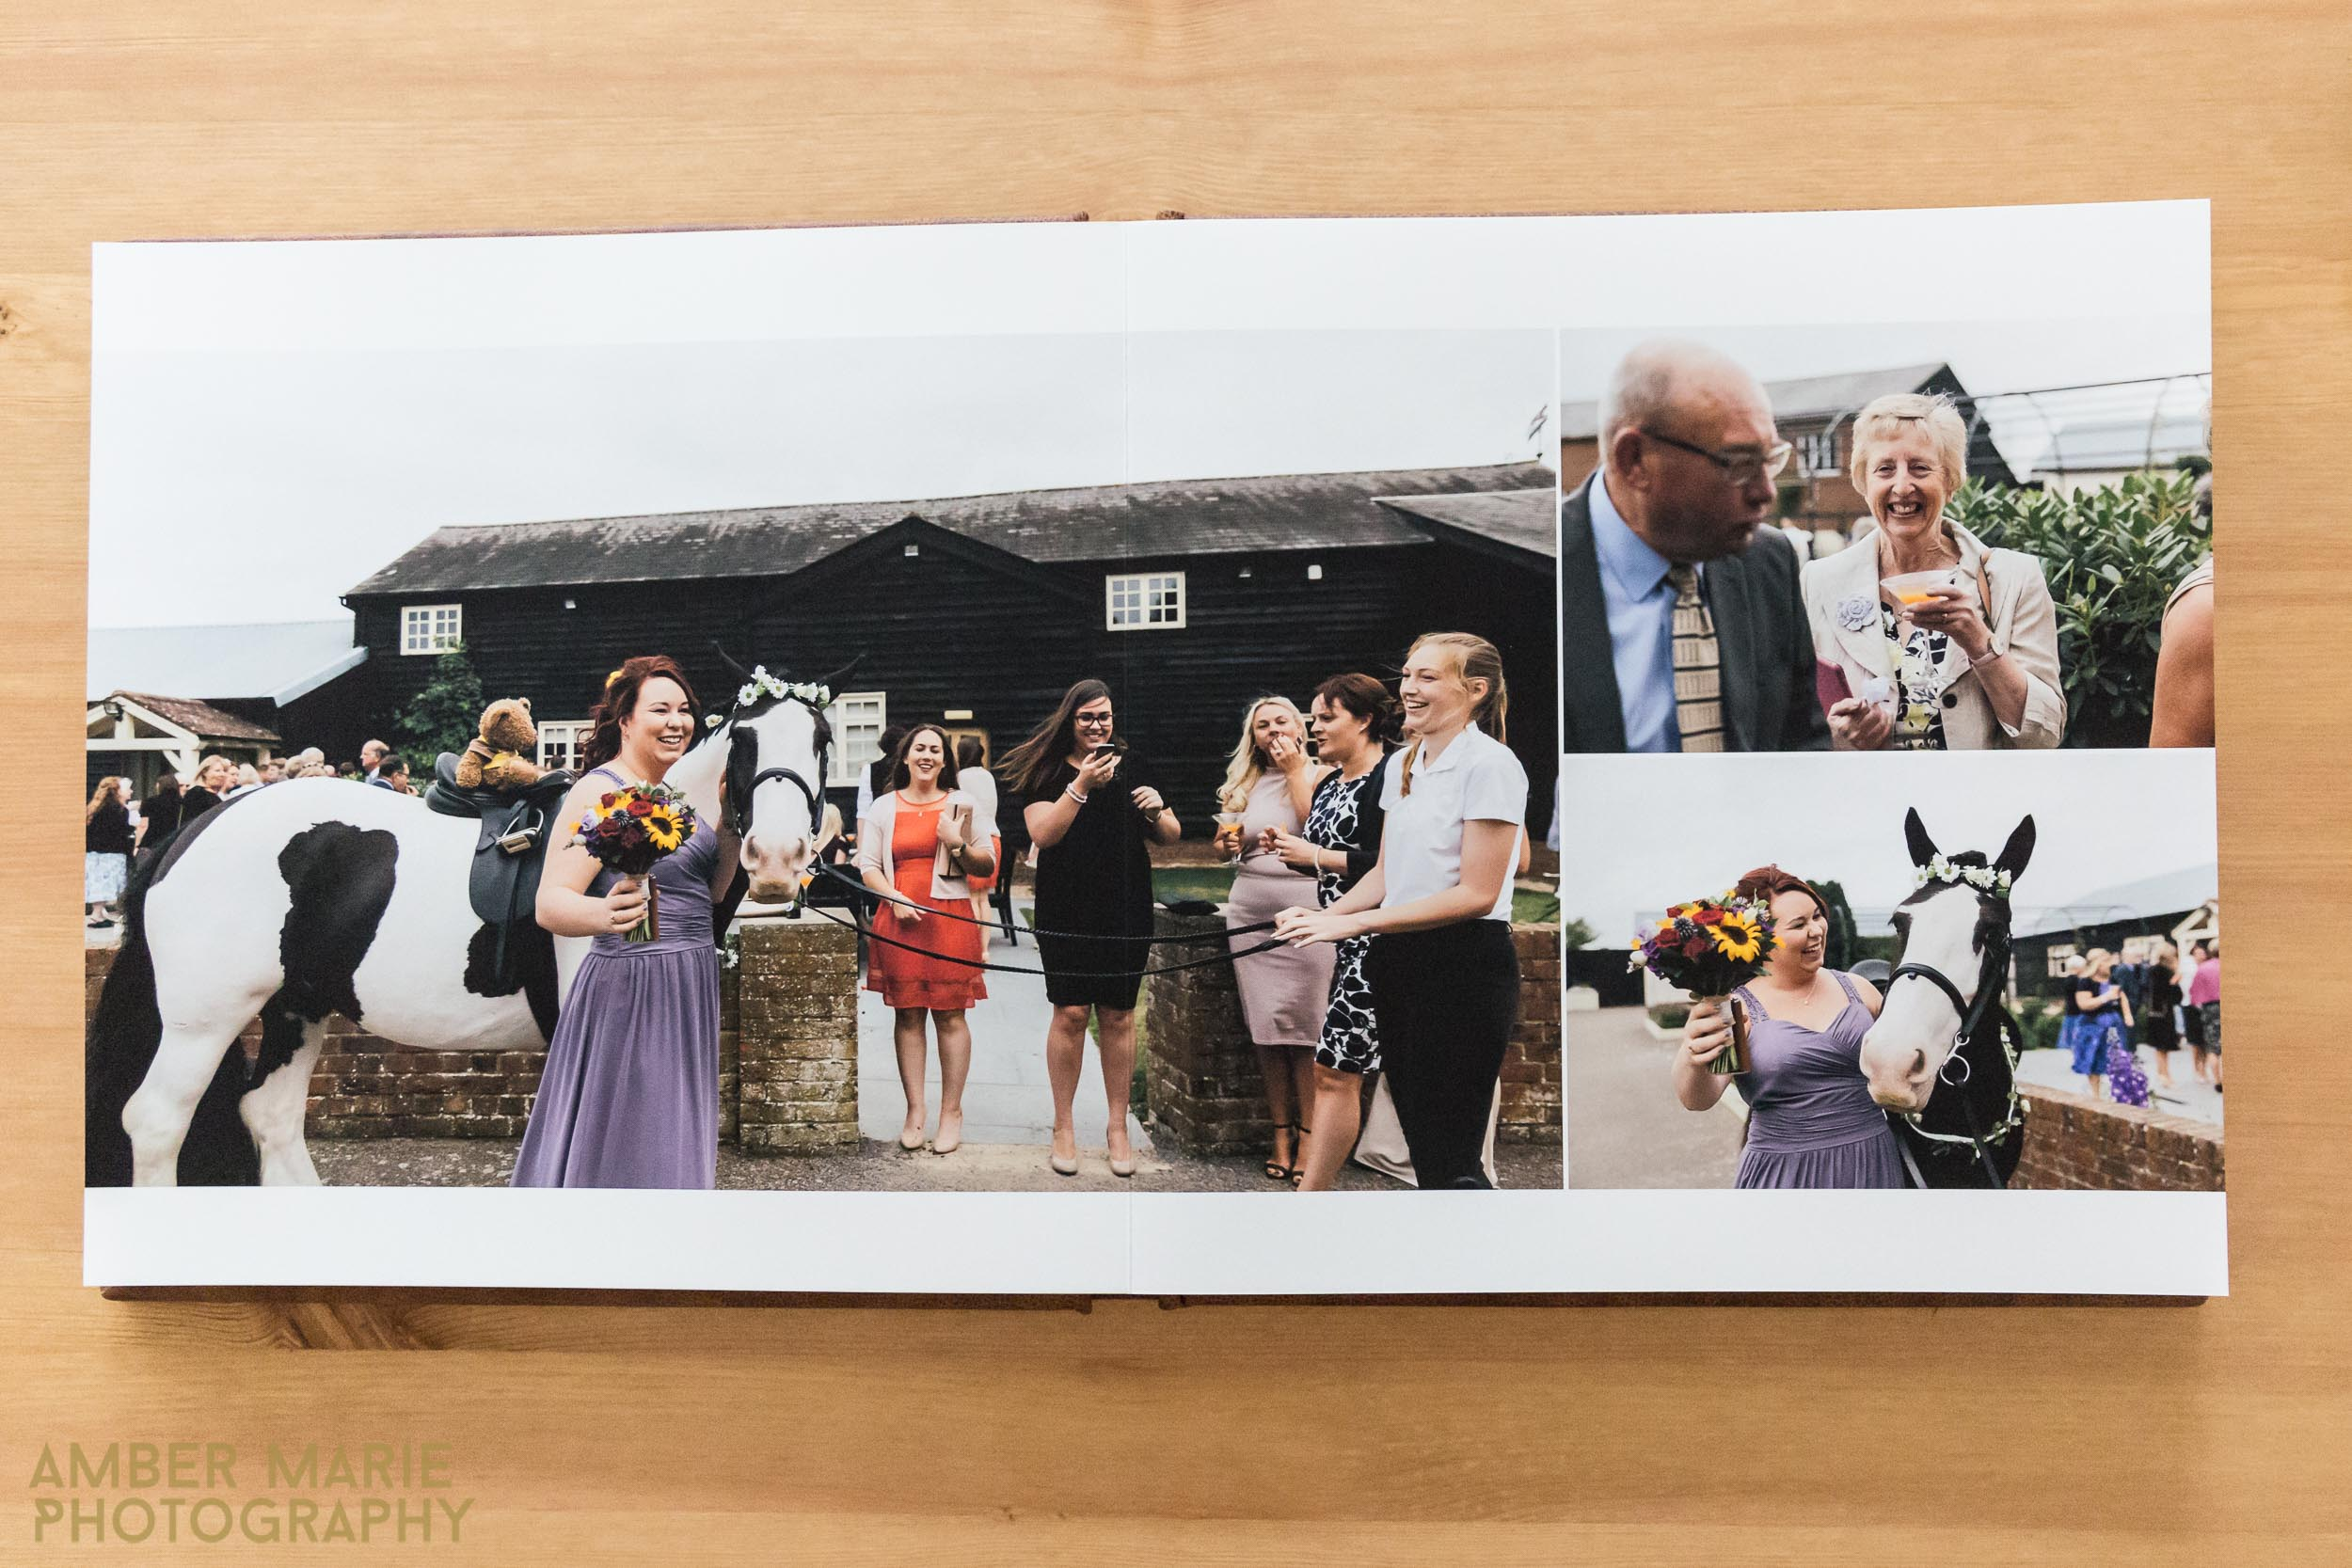 Do we need a Wedding Album by Creative Wedding Photographers Yorkshire